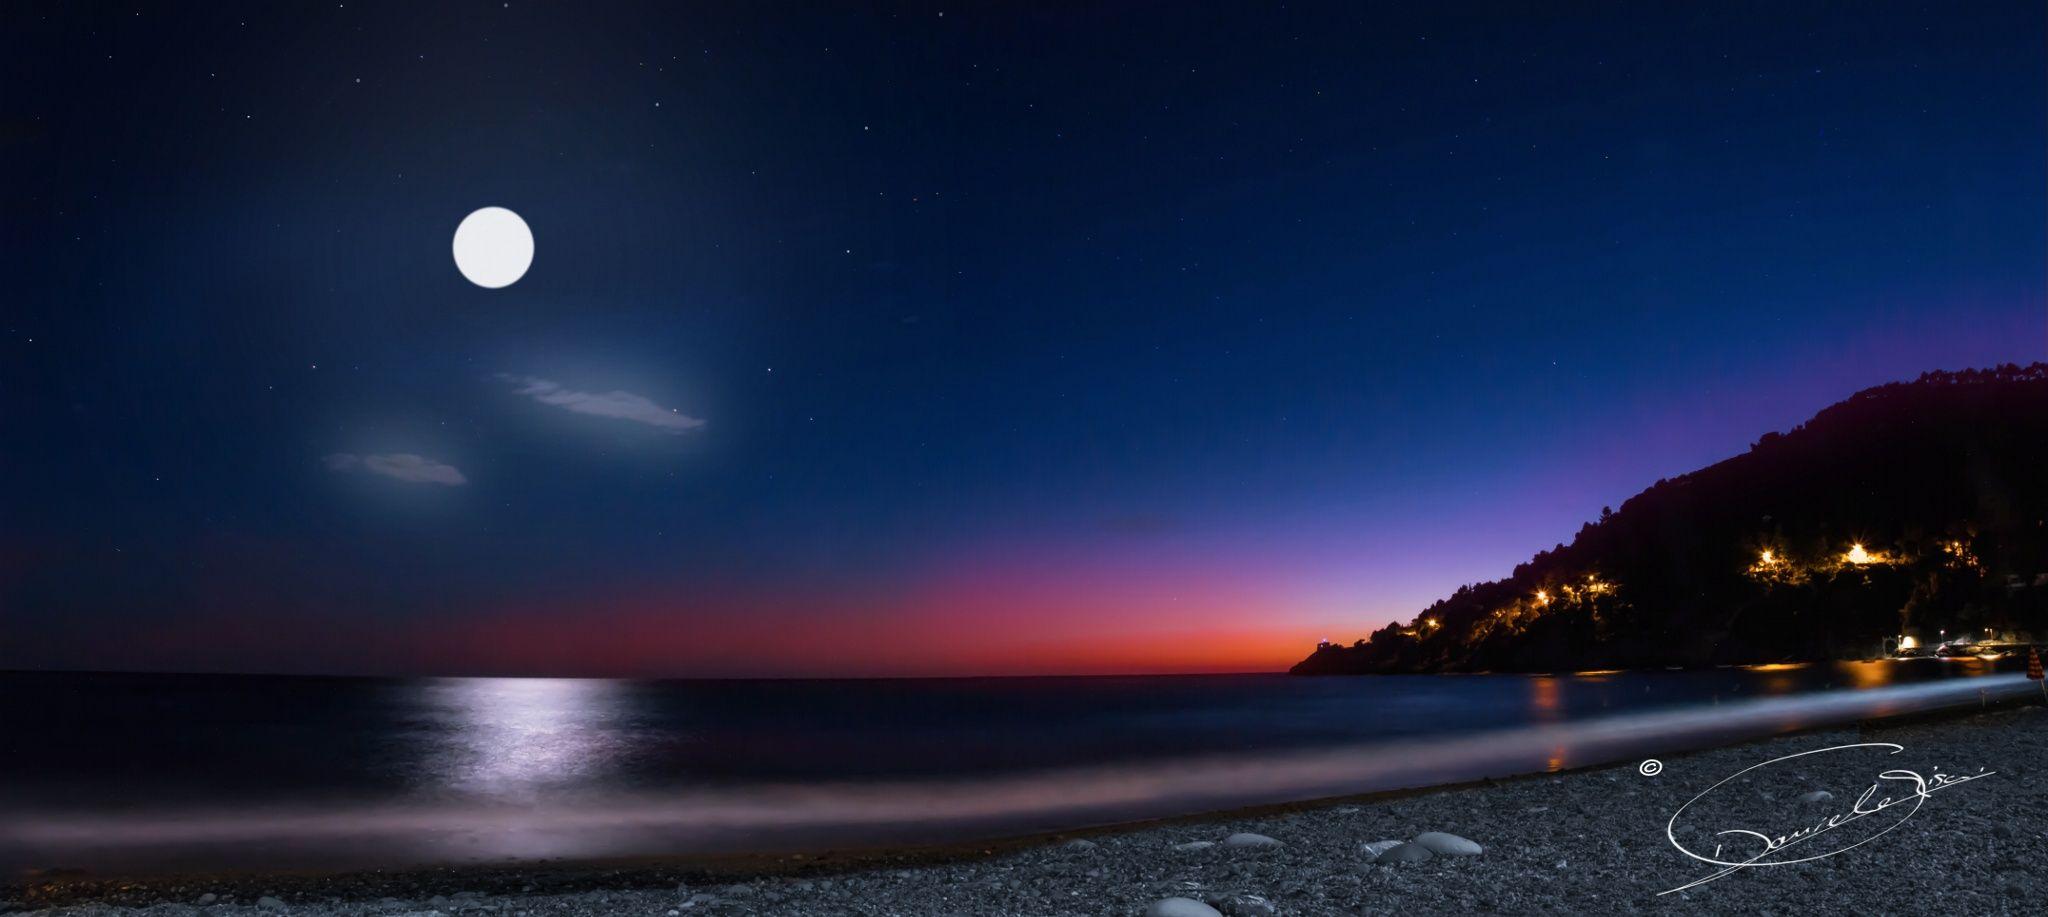 panorama bonassola by Daniele Crisci on 500px